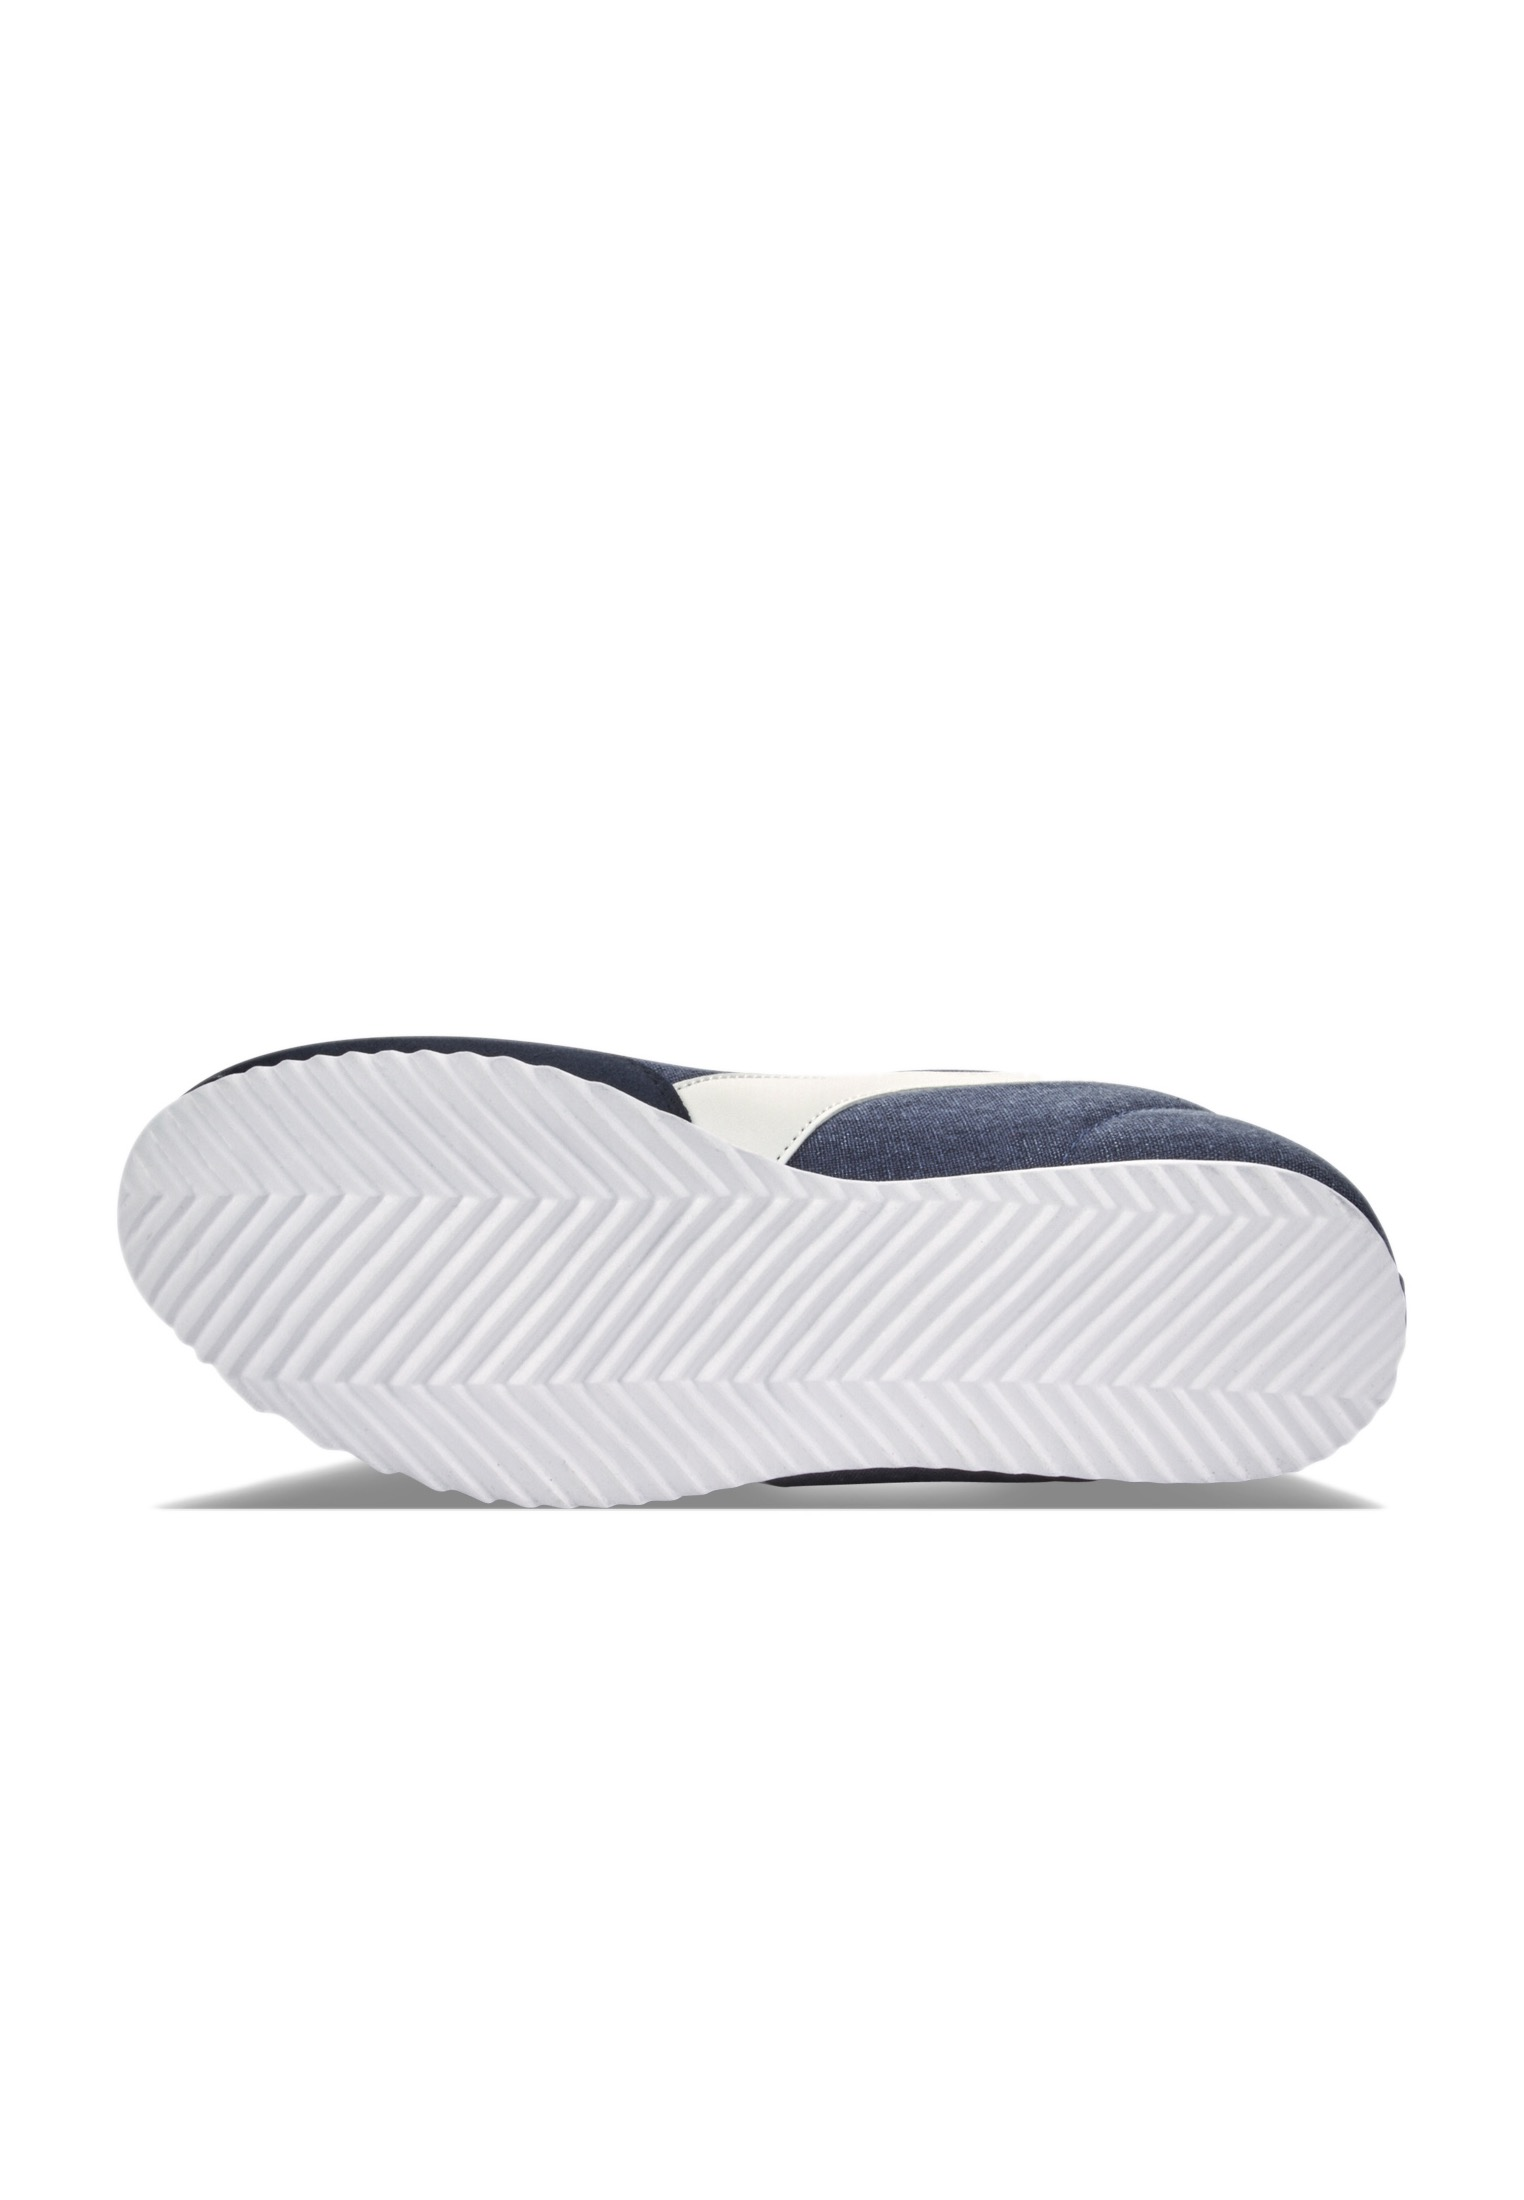 Scarpe-Diadora-Jog-Light-C-Sneakers-sportive-uomo-donna-vari-colori-e-taglie miniatura 21